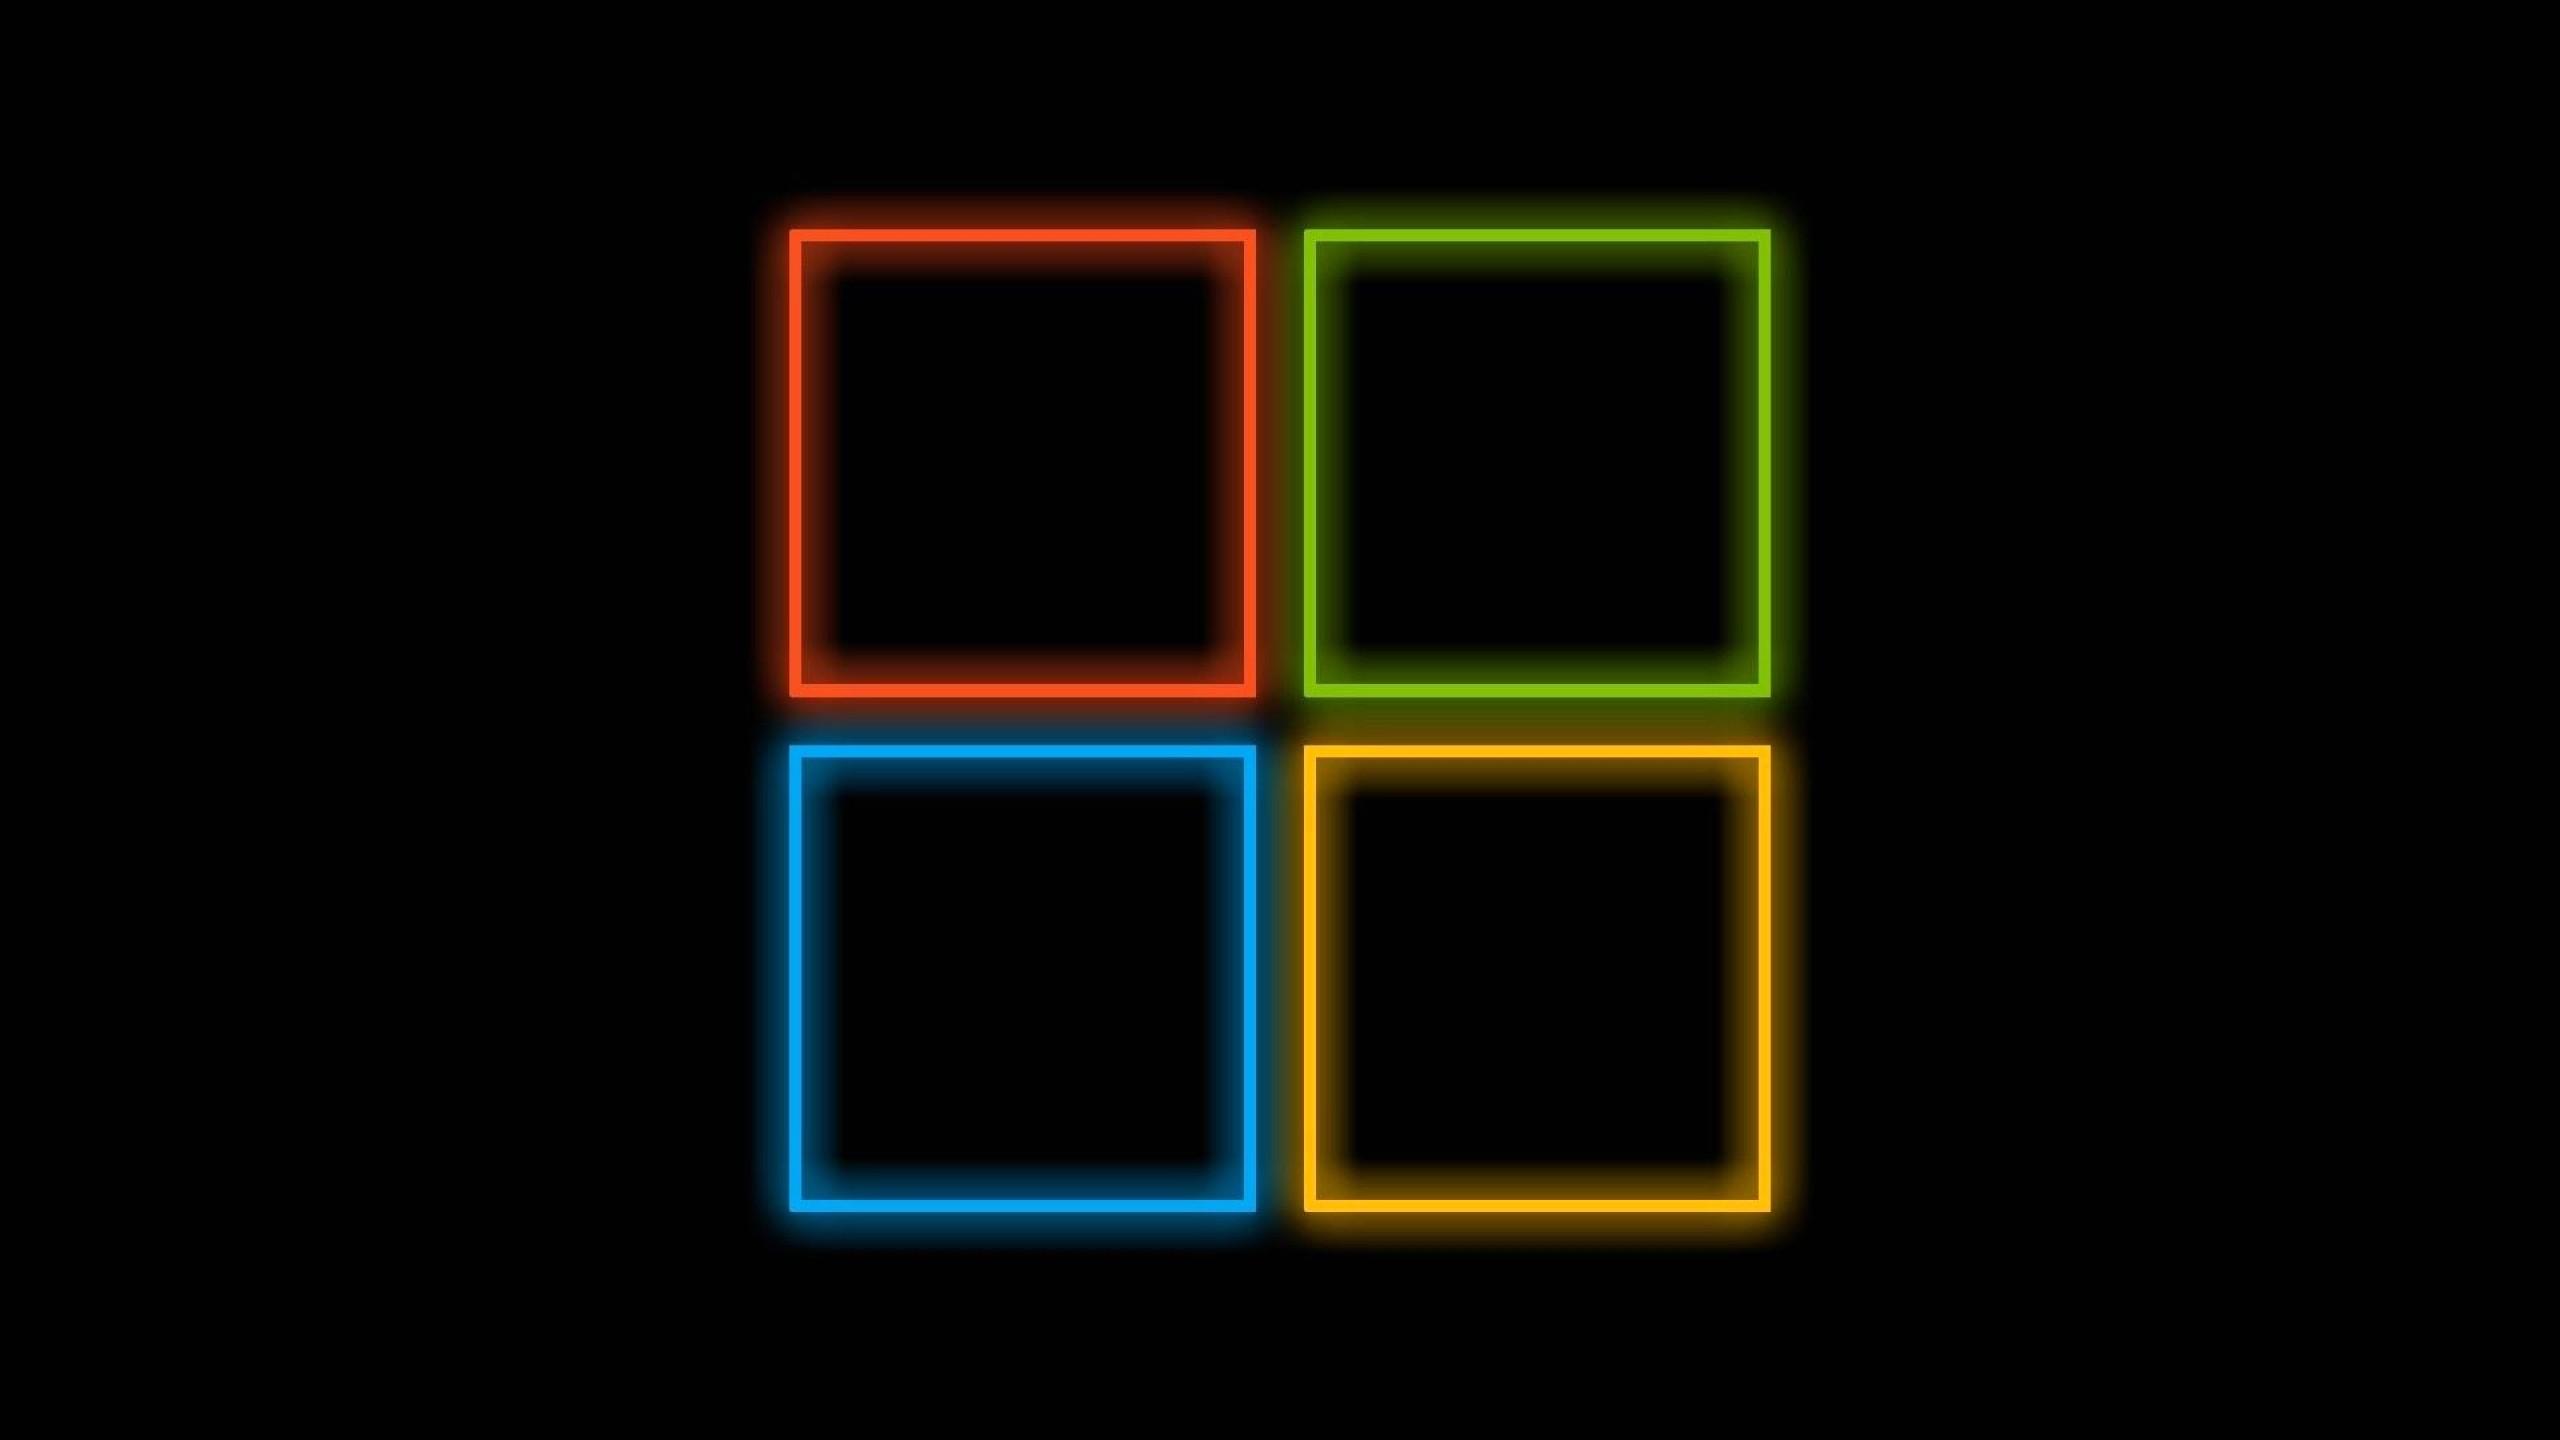 Wallpaper windows 10, operating system, minimalism